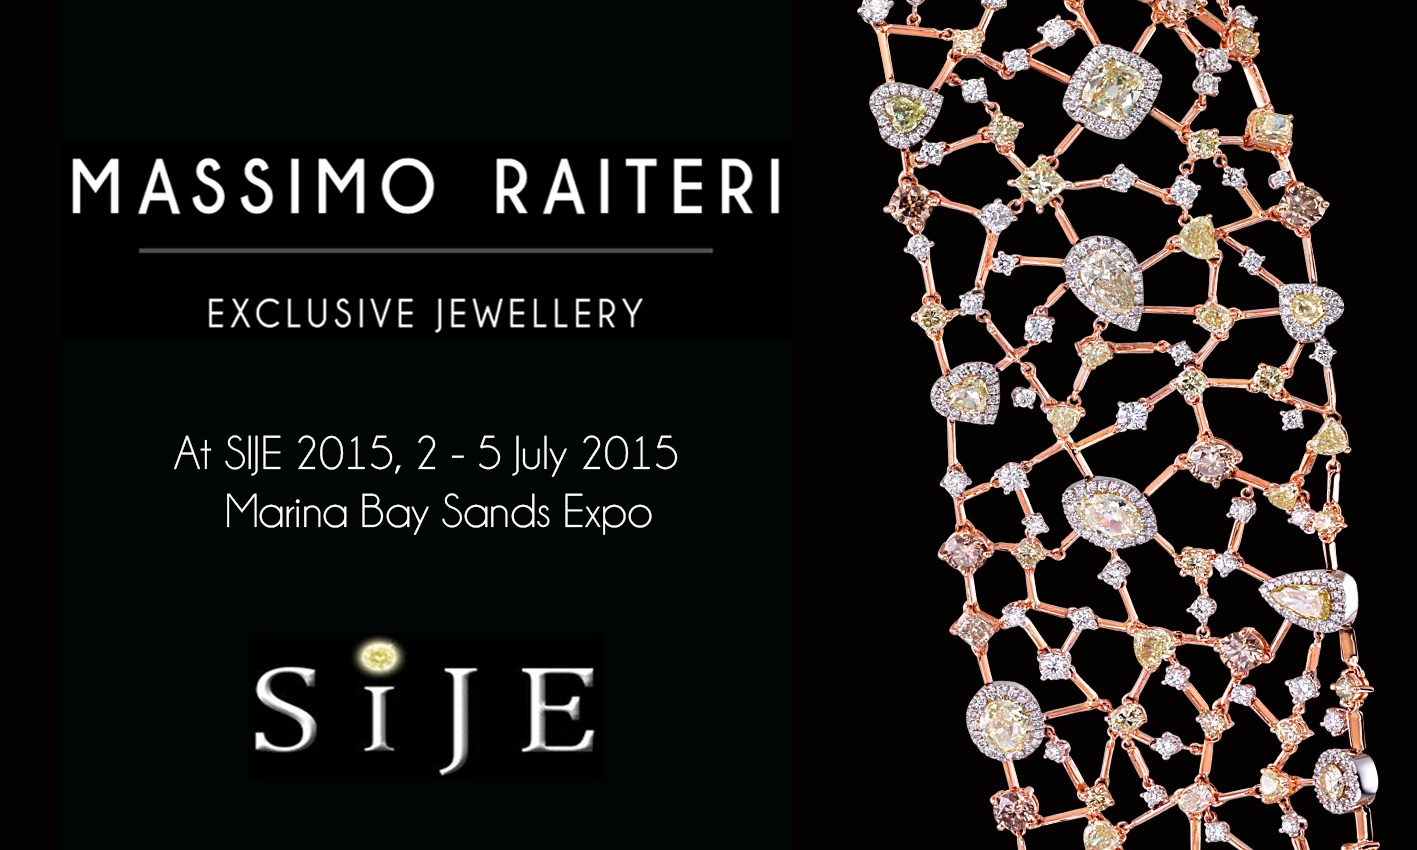 MASSIMO RAITERI ALLA SINGAPORE INTERNATIONAL JEWELLERY EXPO (SIJE) 2015